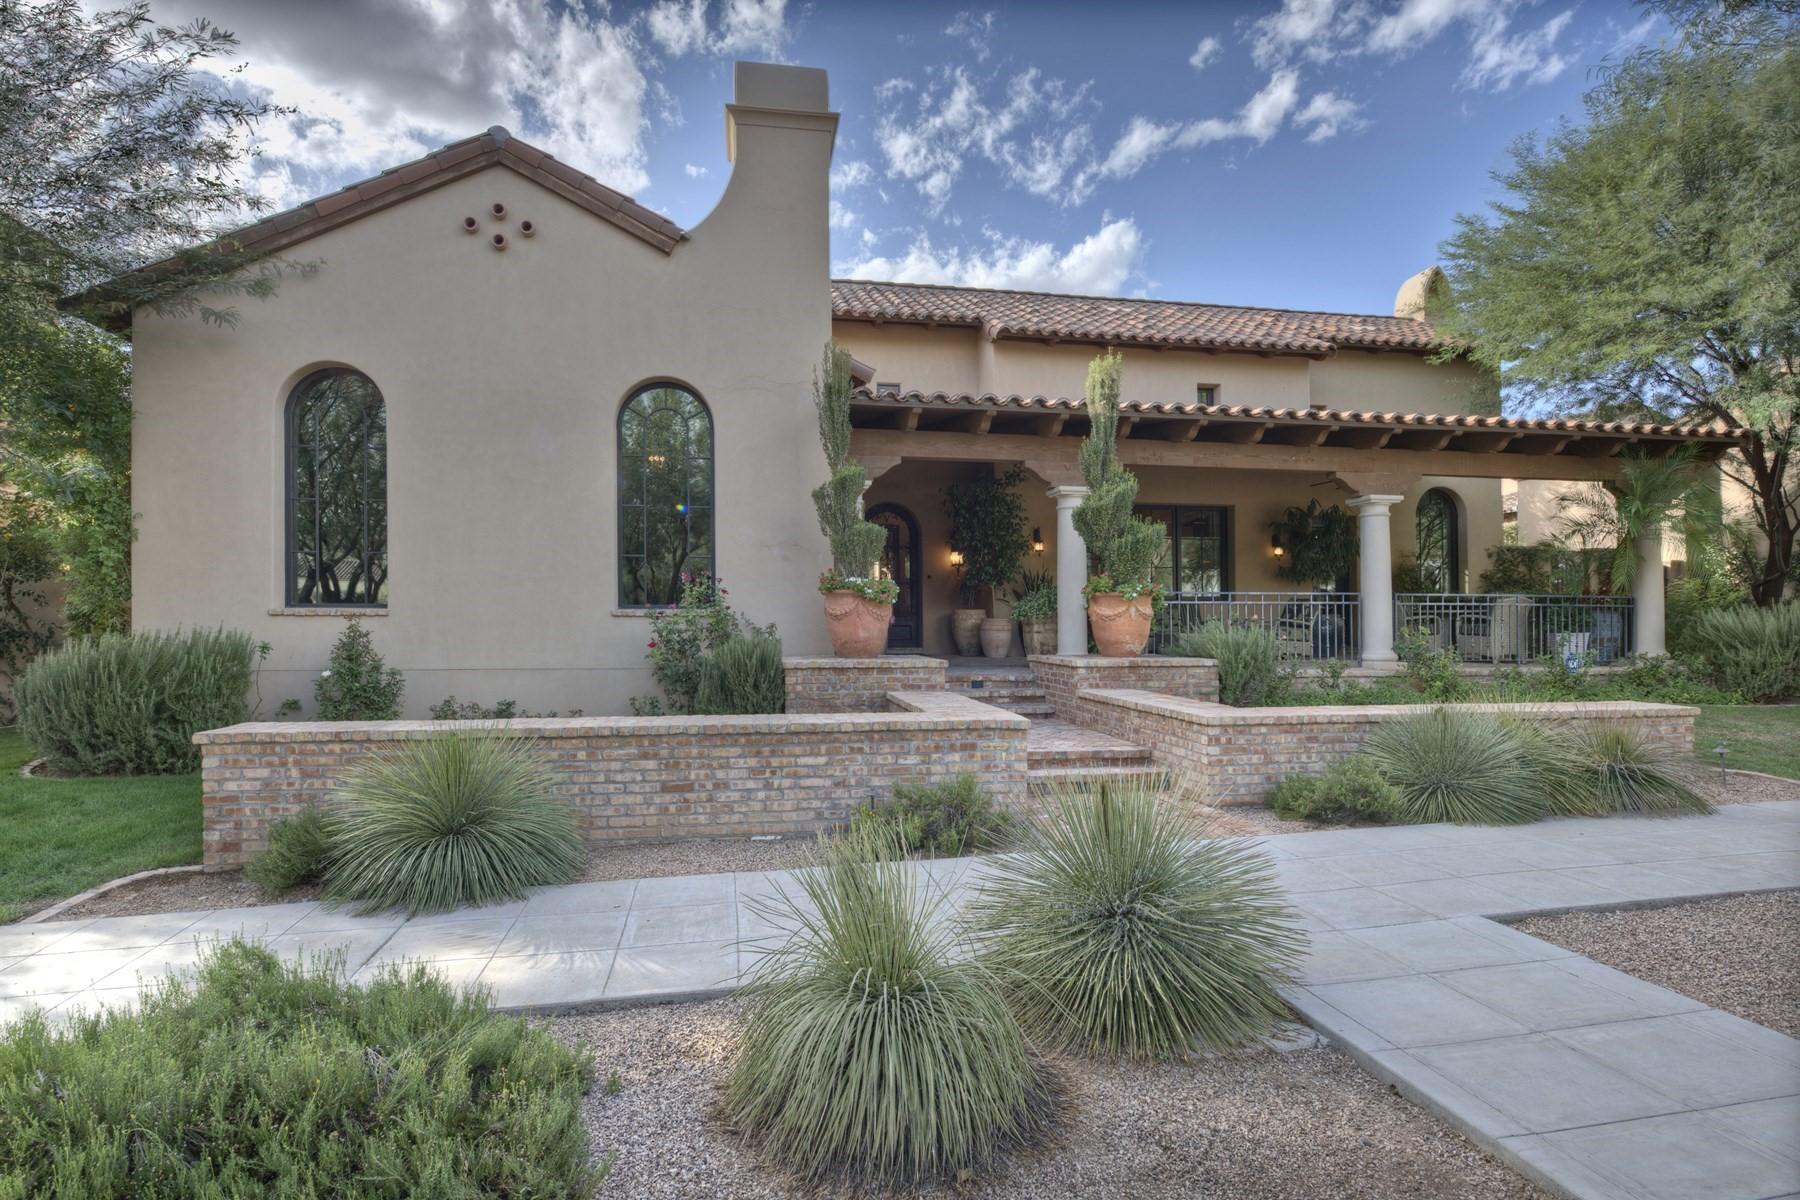 Casa para uma família para Venda às Wonderful ''Salcito'' homestead property in Silverleaf 20664 N 101st Way Scottsdale, Arizona, 85255 Estados Unidos